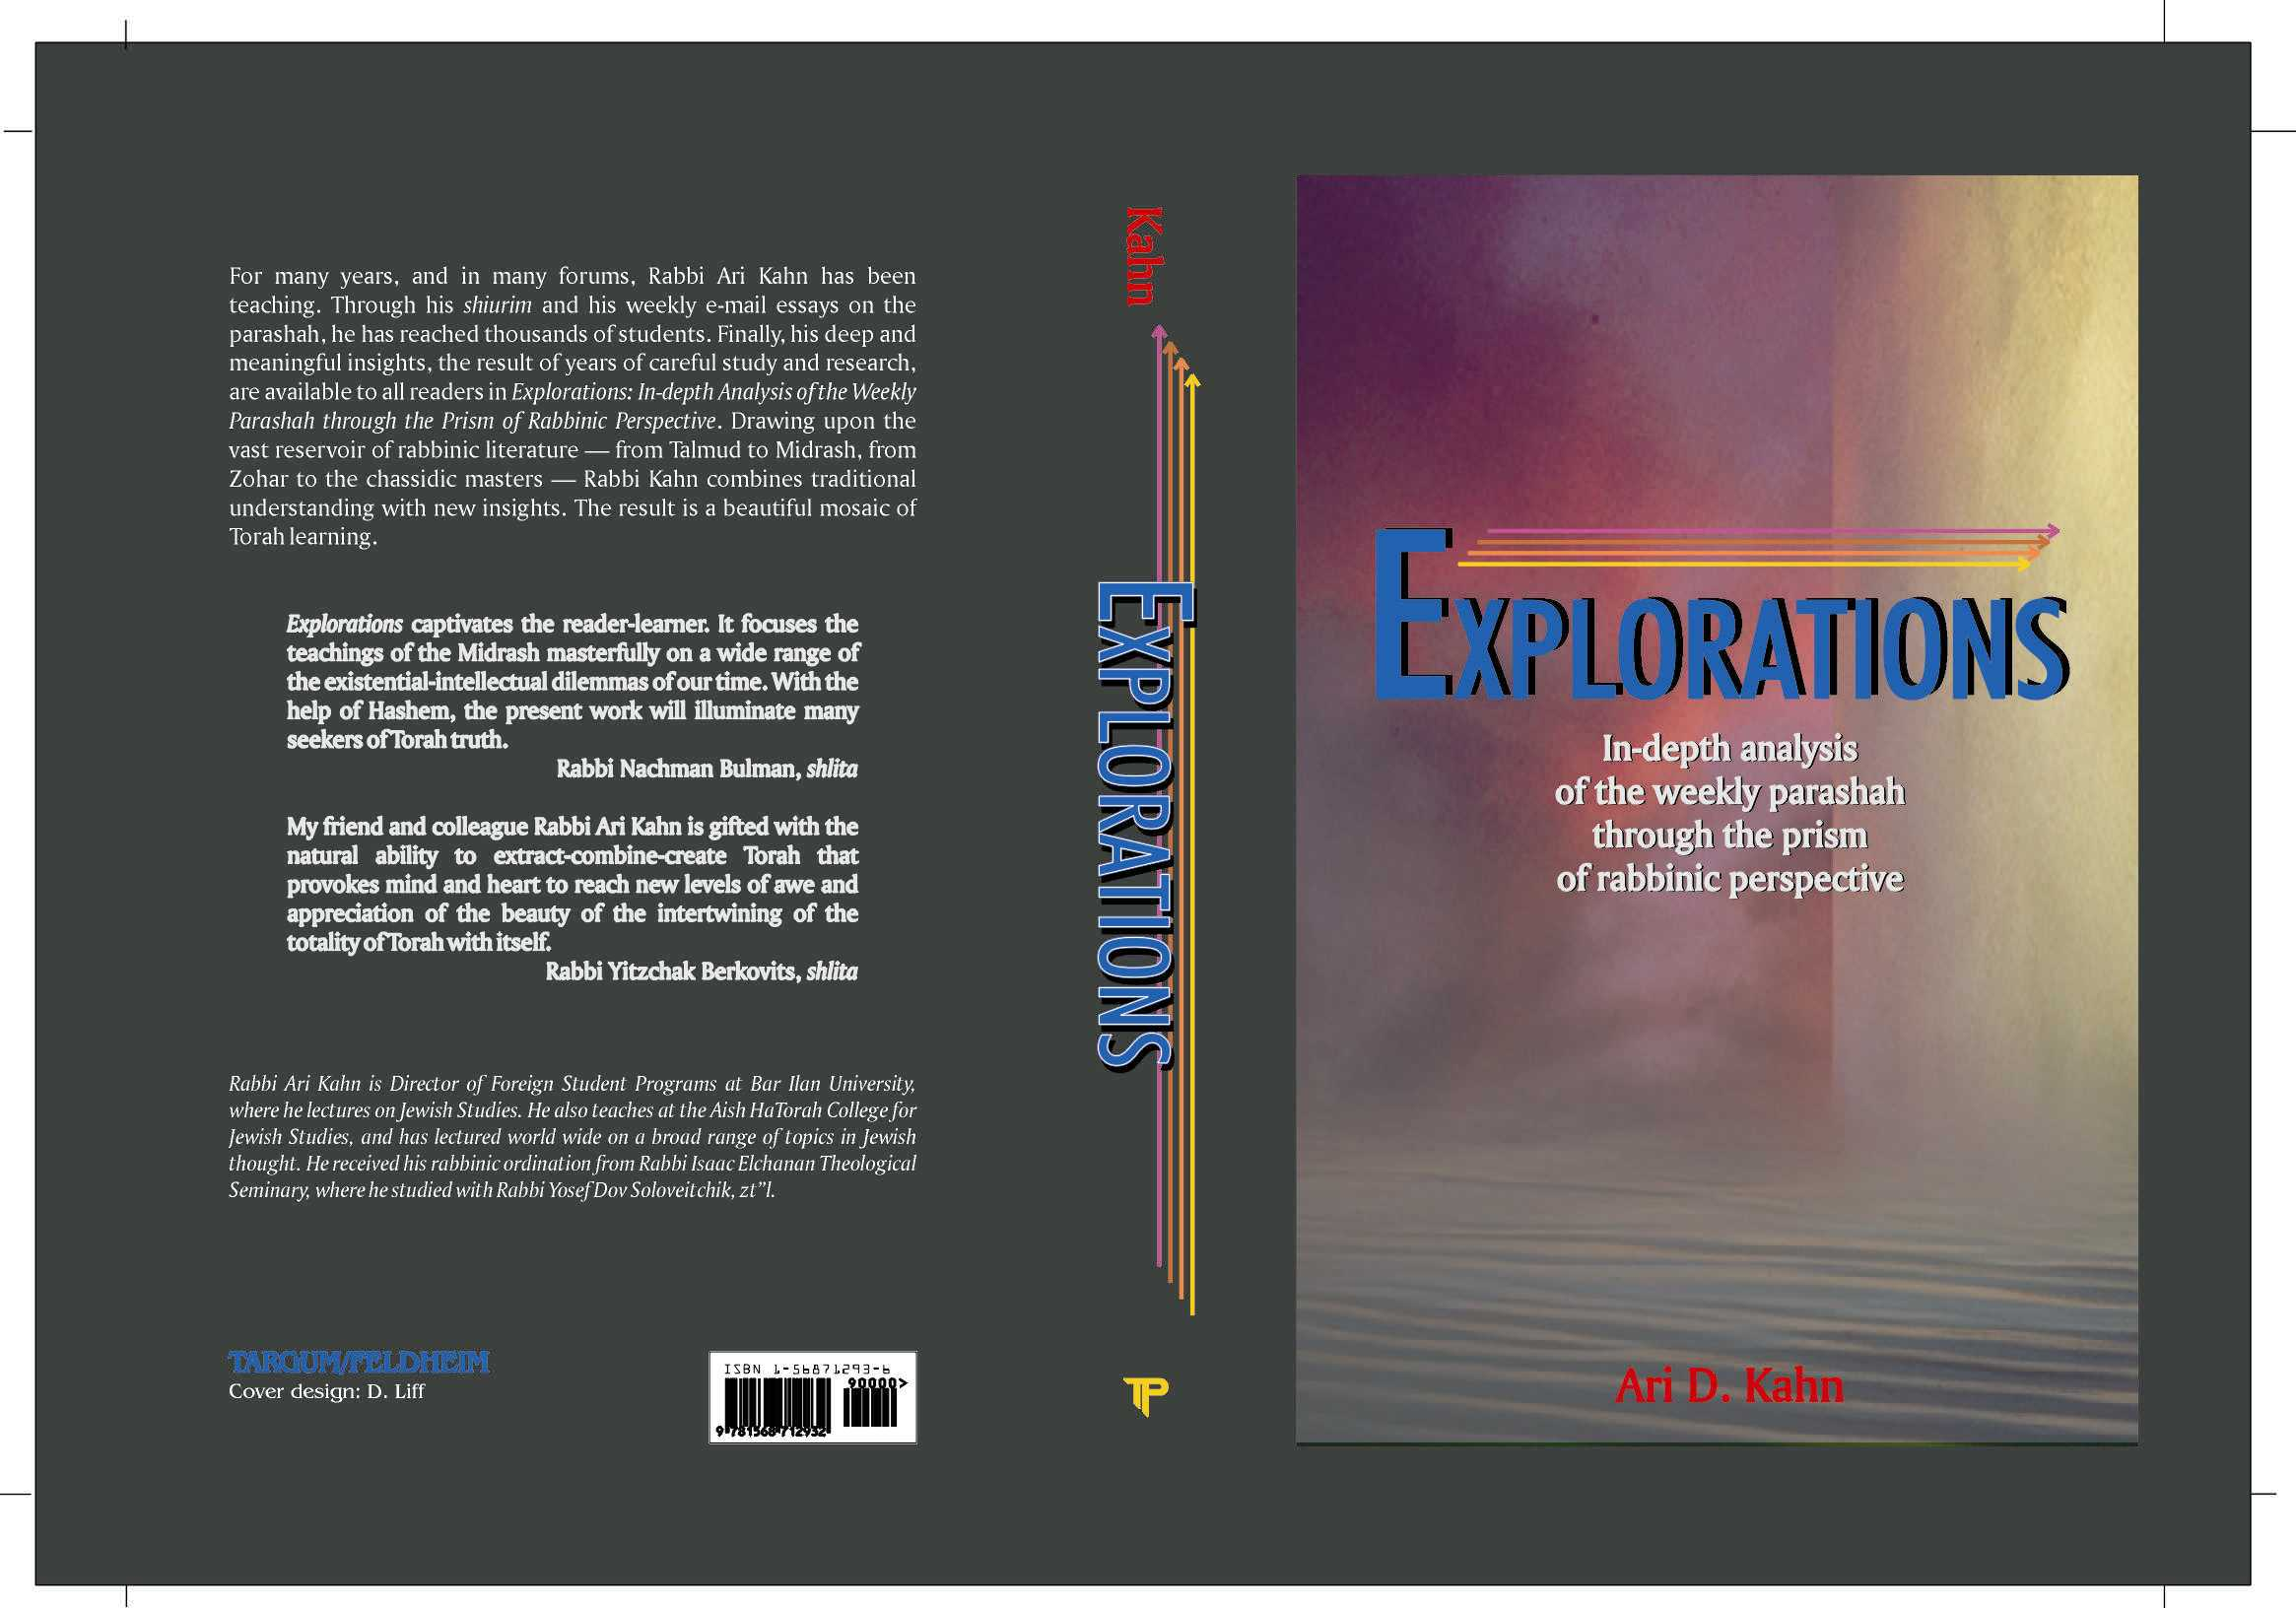 explorations1.jpg